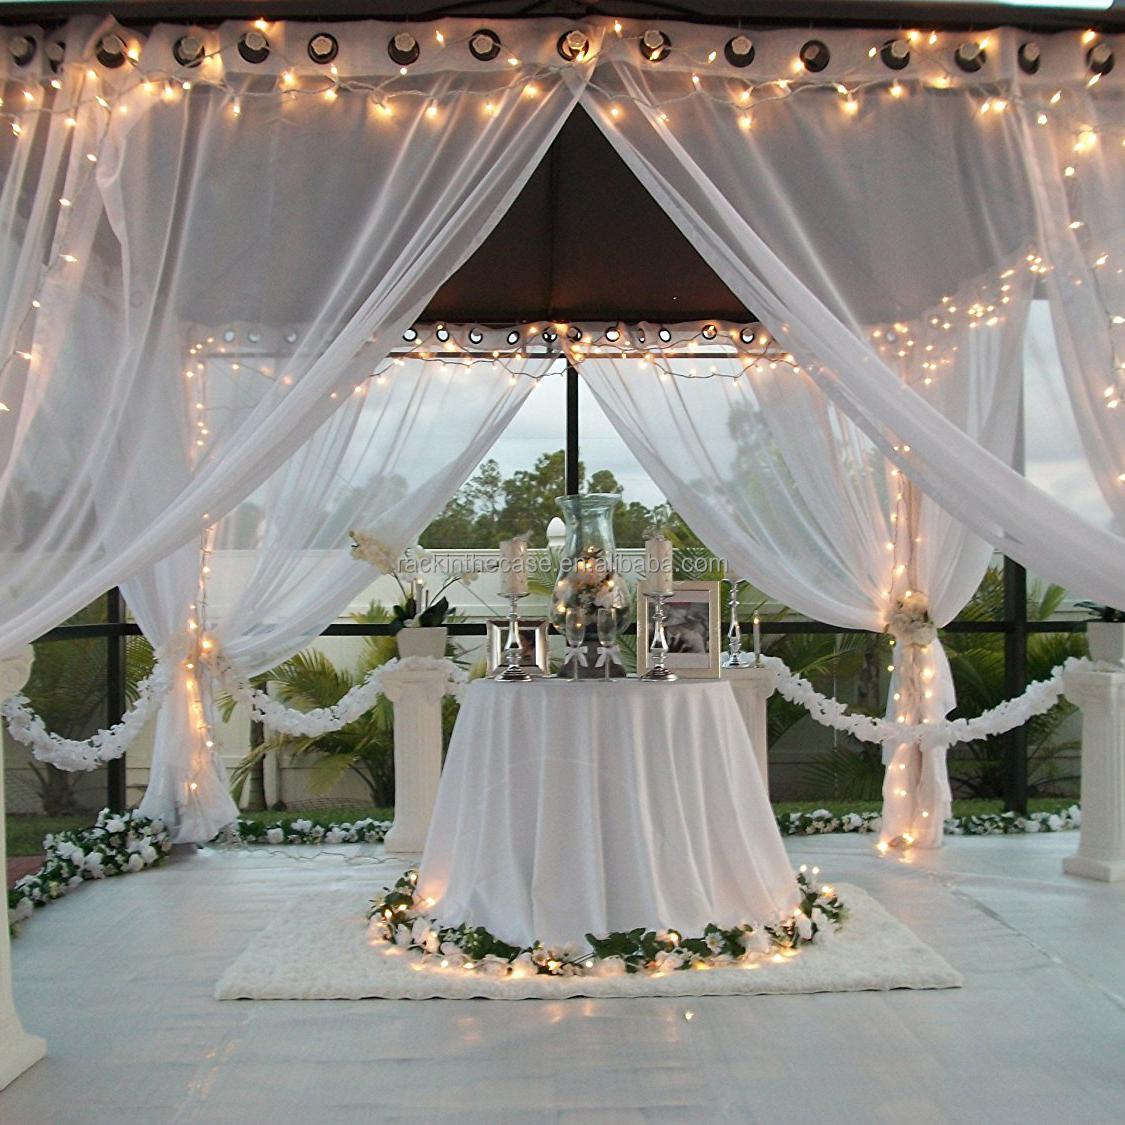 Rk Wedding Decoration Telescopic Pipe And Drape Backdrops Buy Portable Wedding Backdrop Unique Wedding Backdrops Elegant Wedding Backdrops Product On Alibaba Com